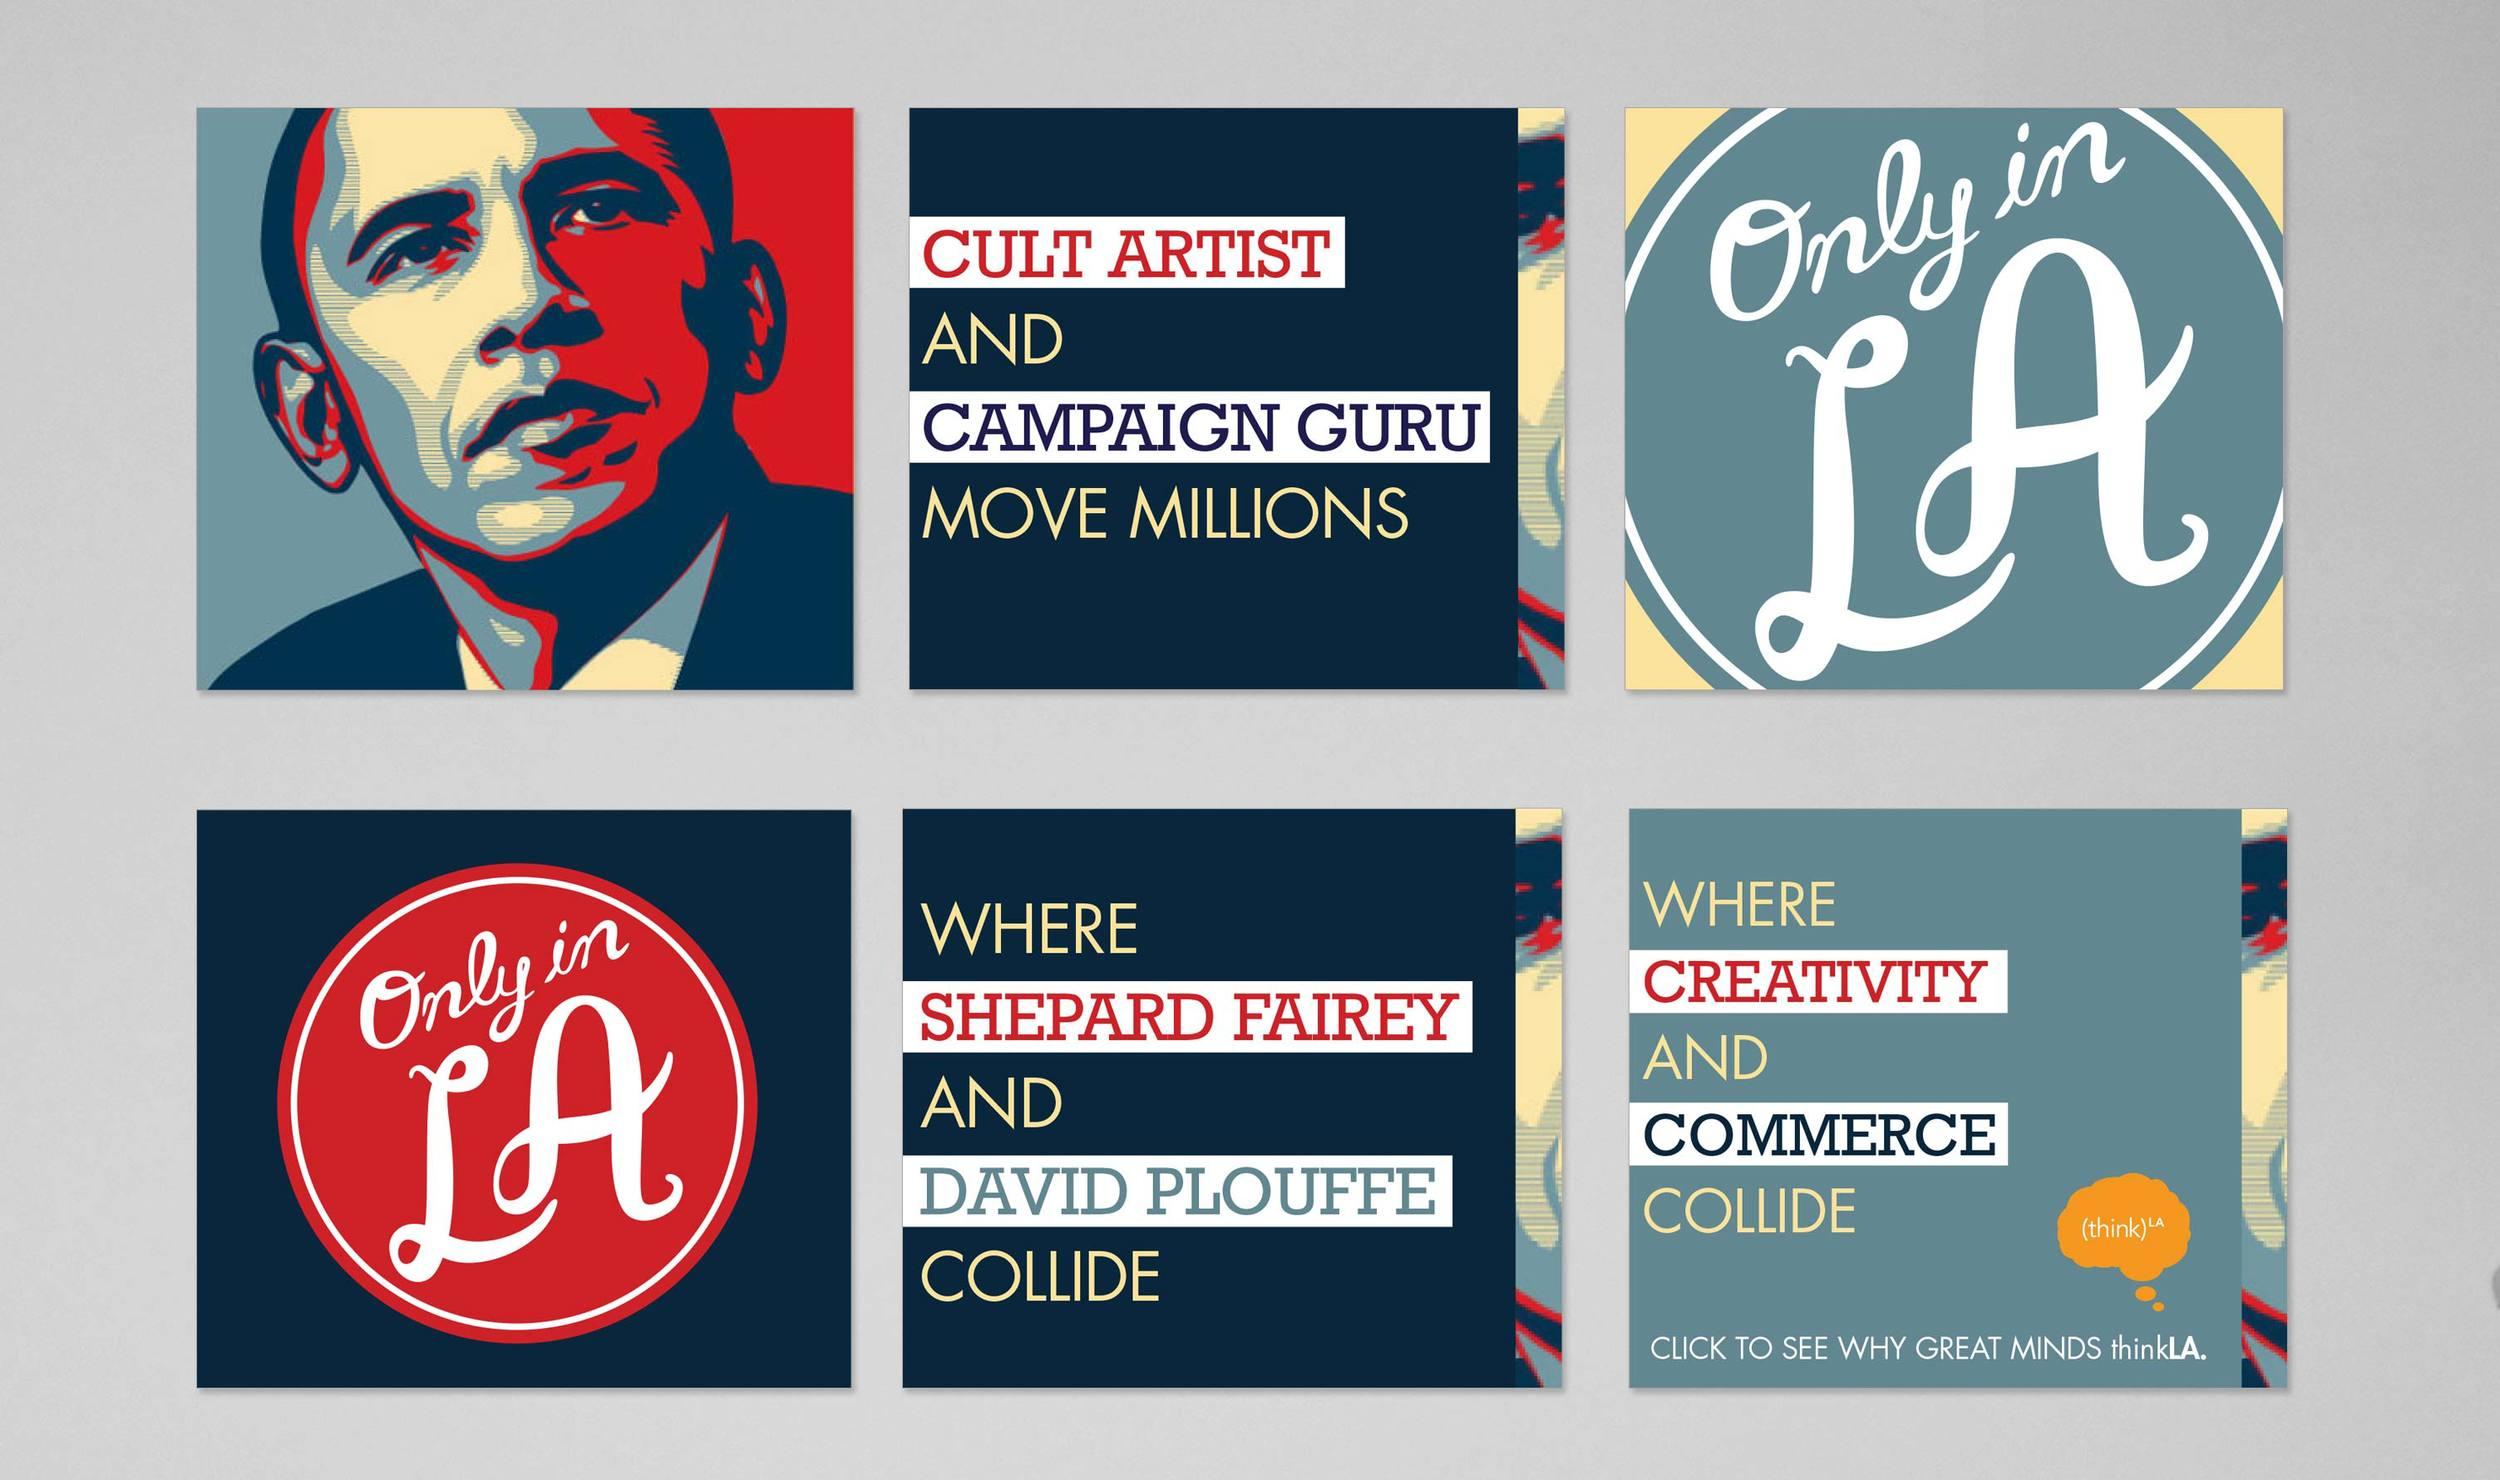 OILA_banners_Obama_3.jpg